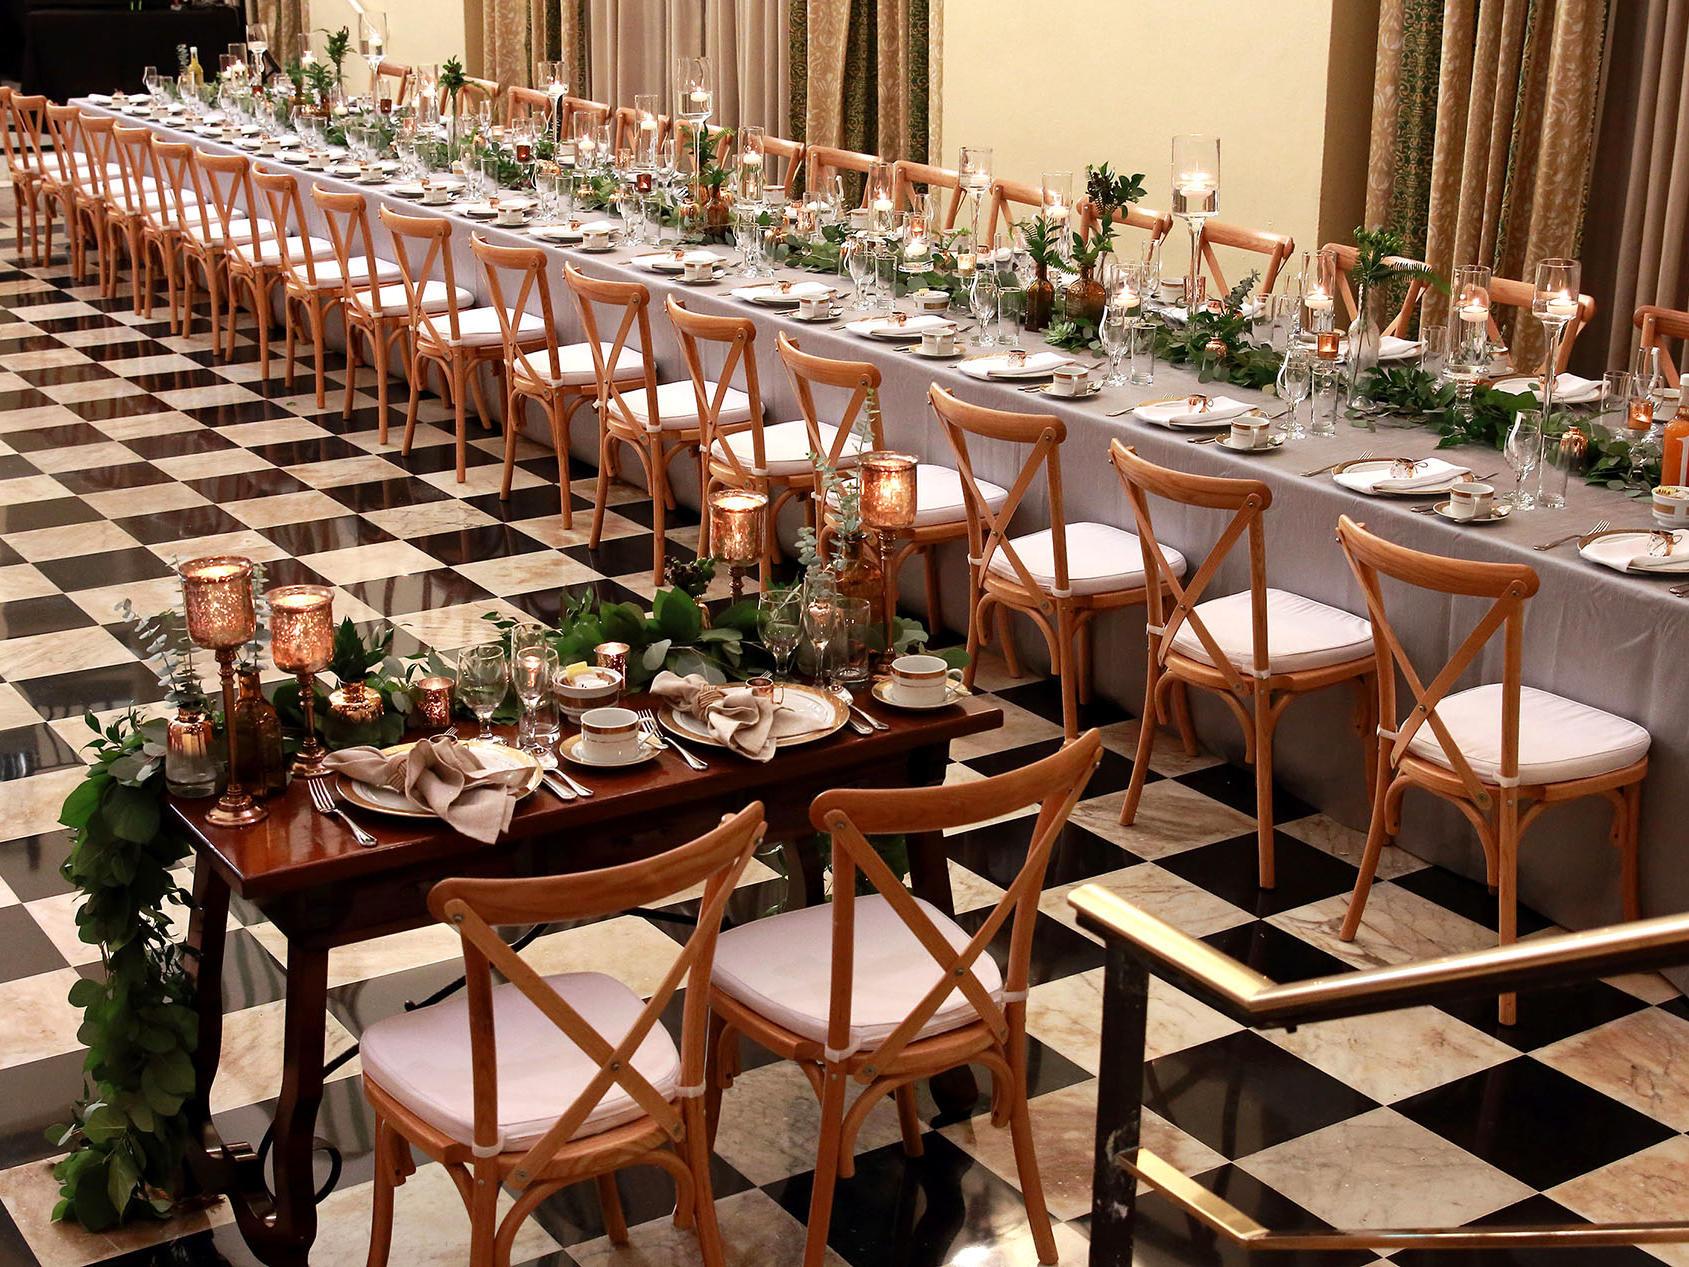 wedding event setting